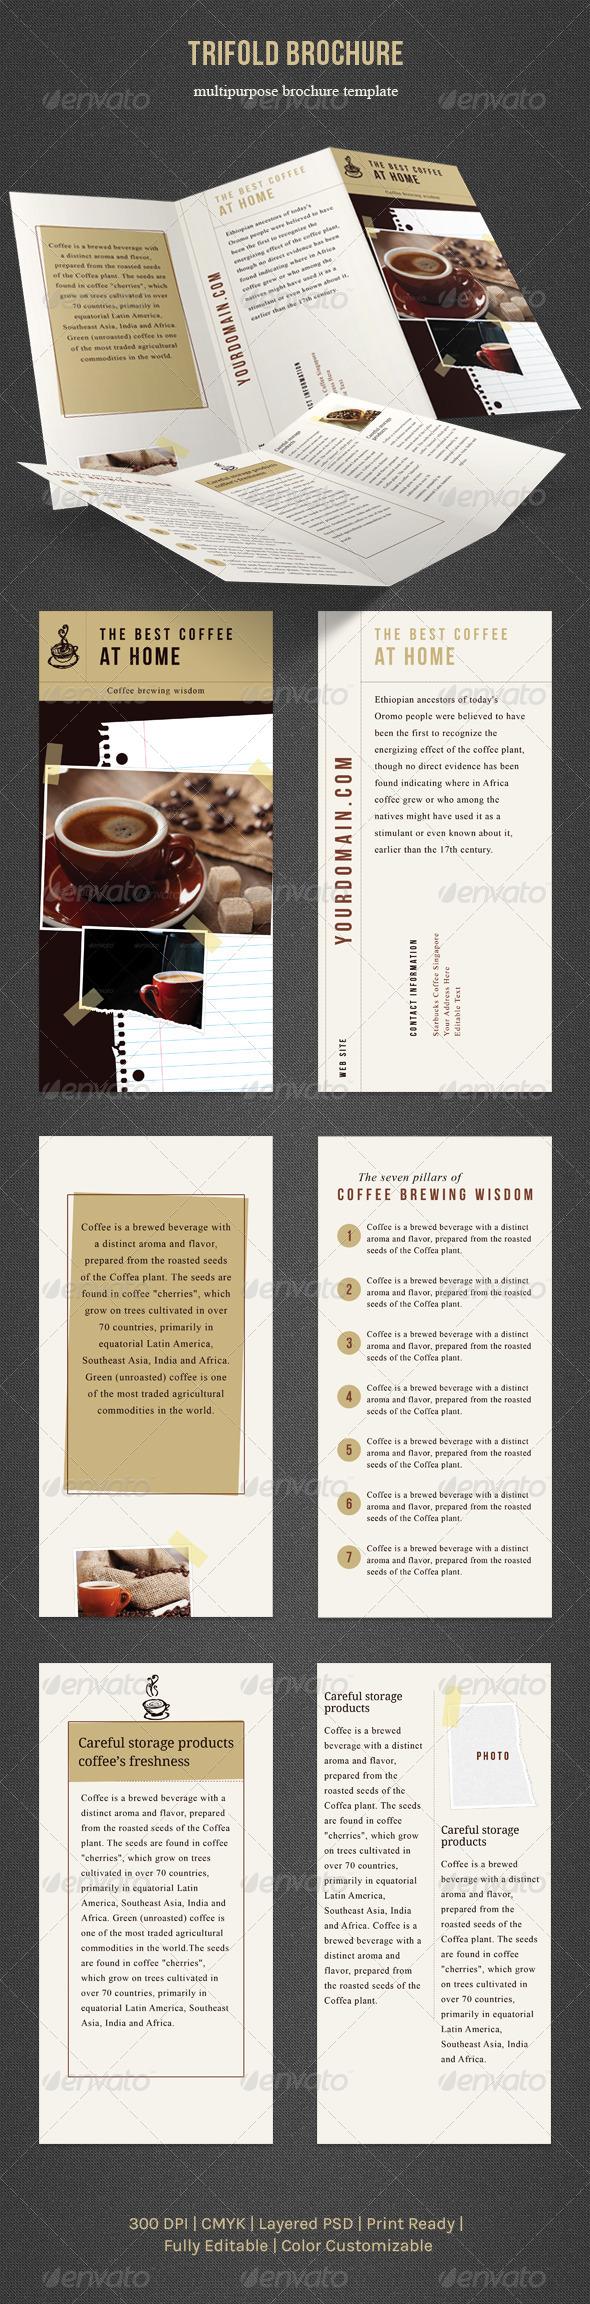 GraphicRiver Trifold Brochure 4139850